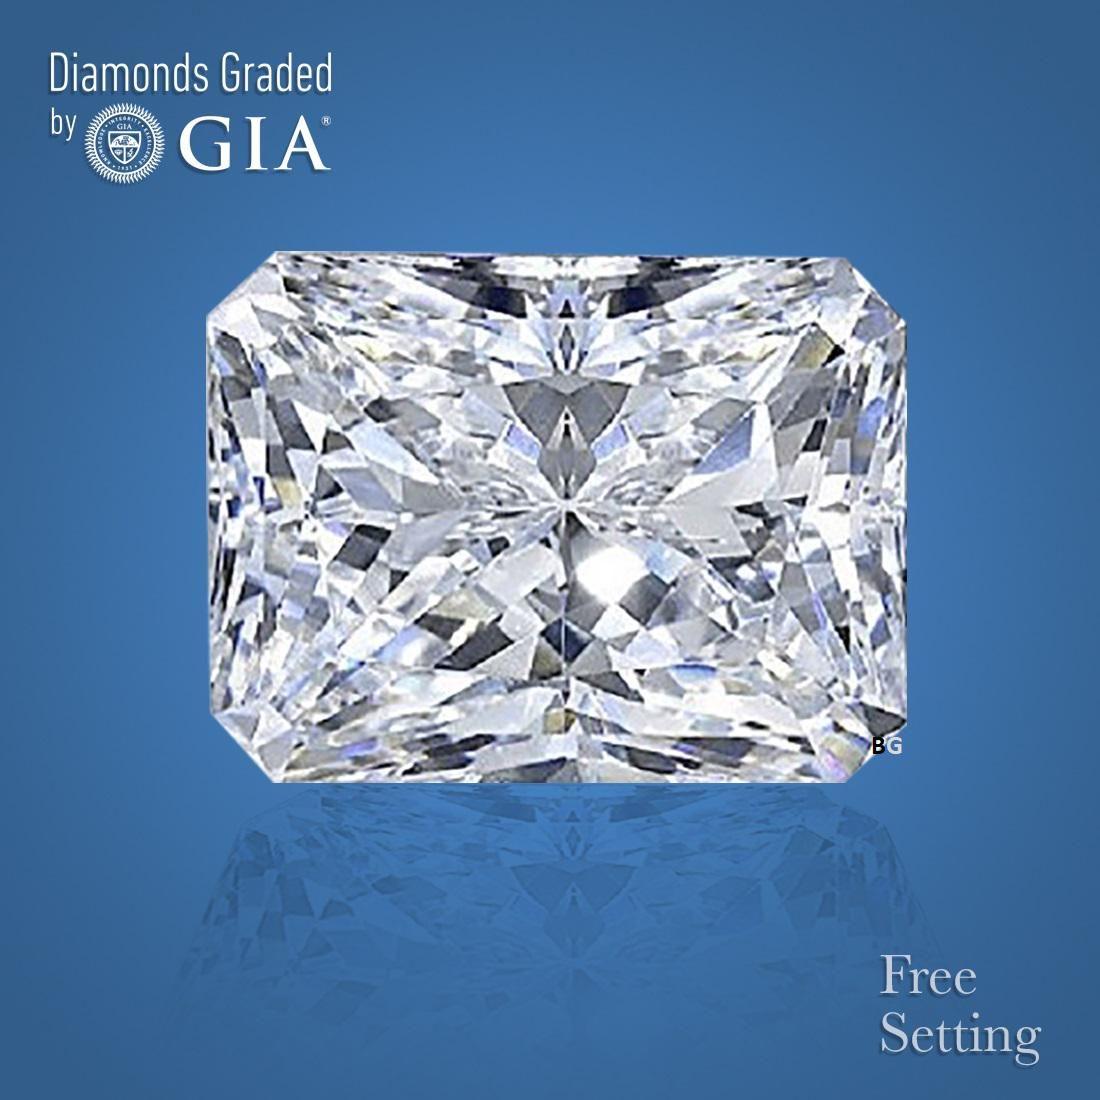 2.51 ct, Color I/VVS1, Radiant cut GIA Graded Diamond